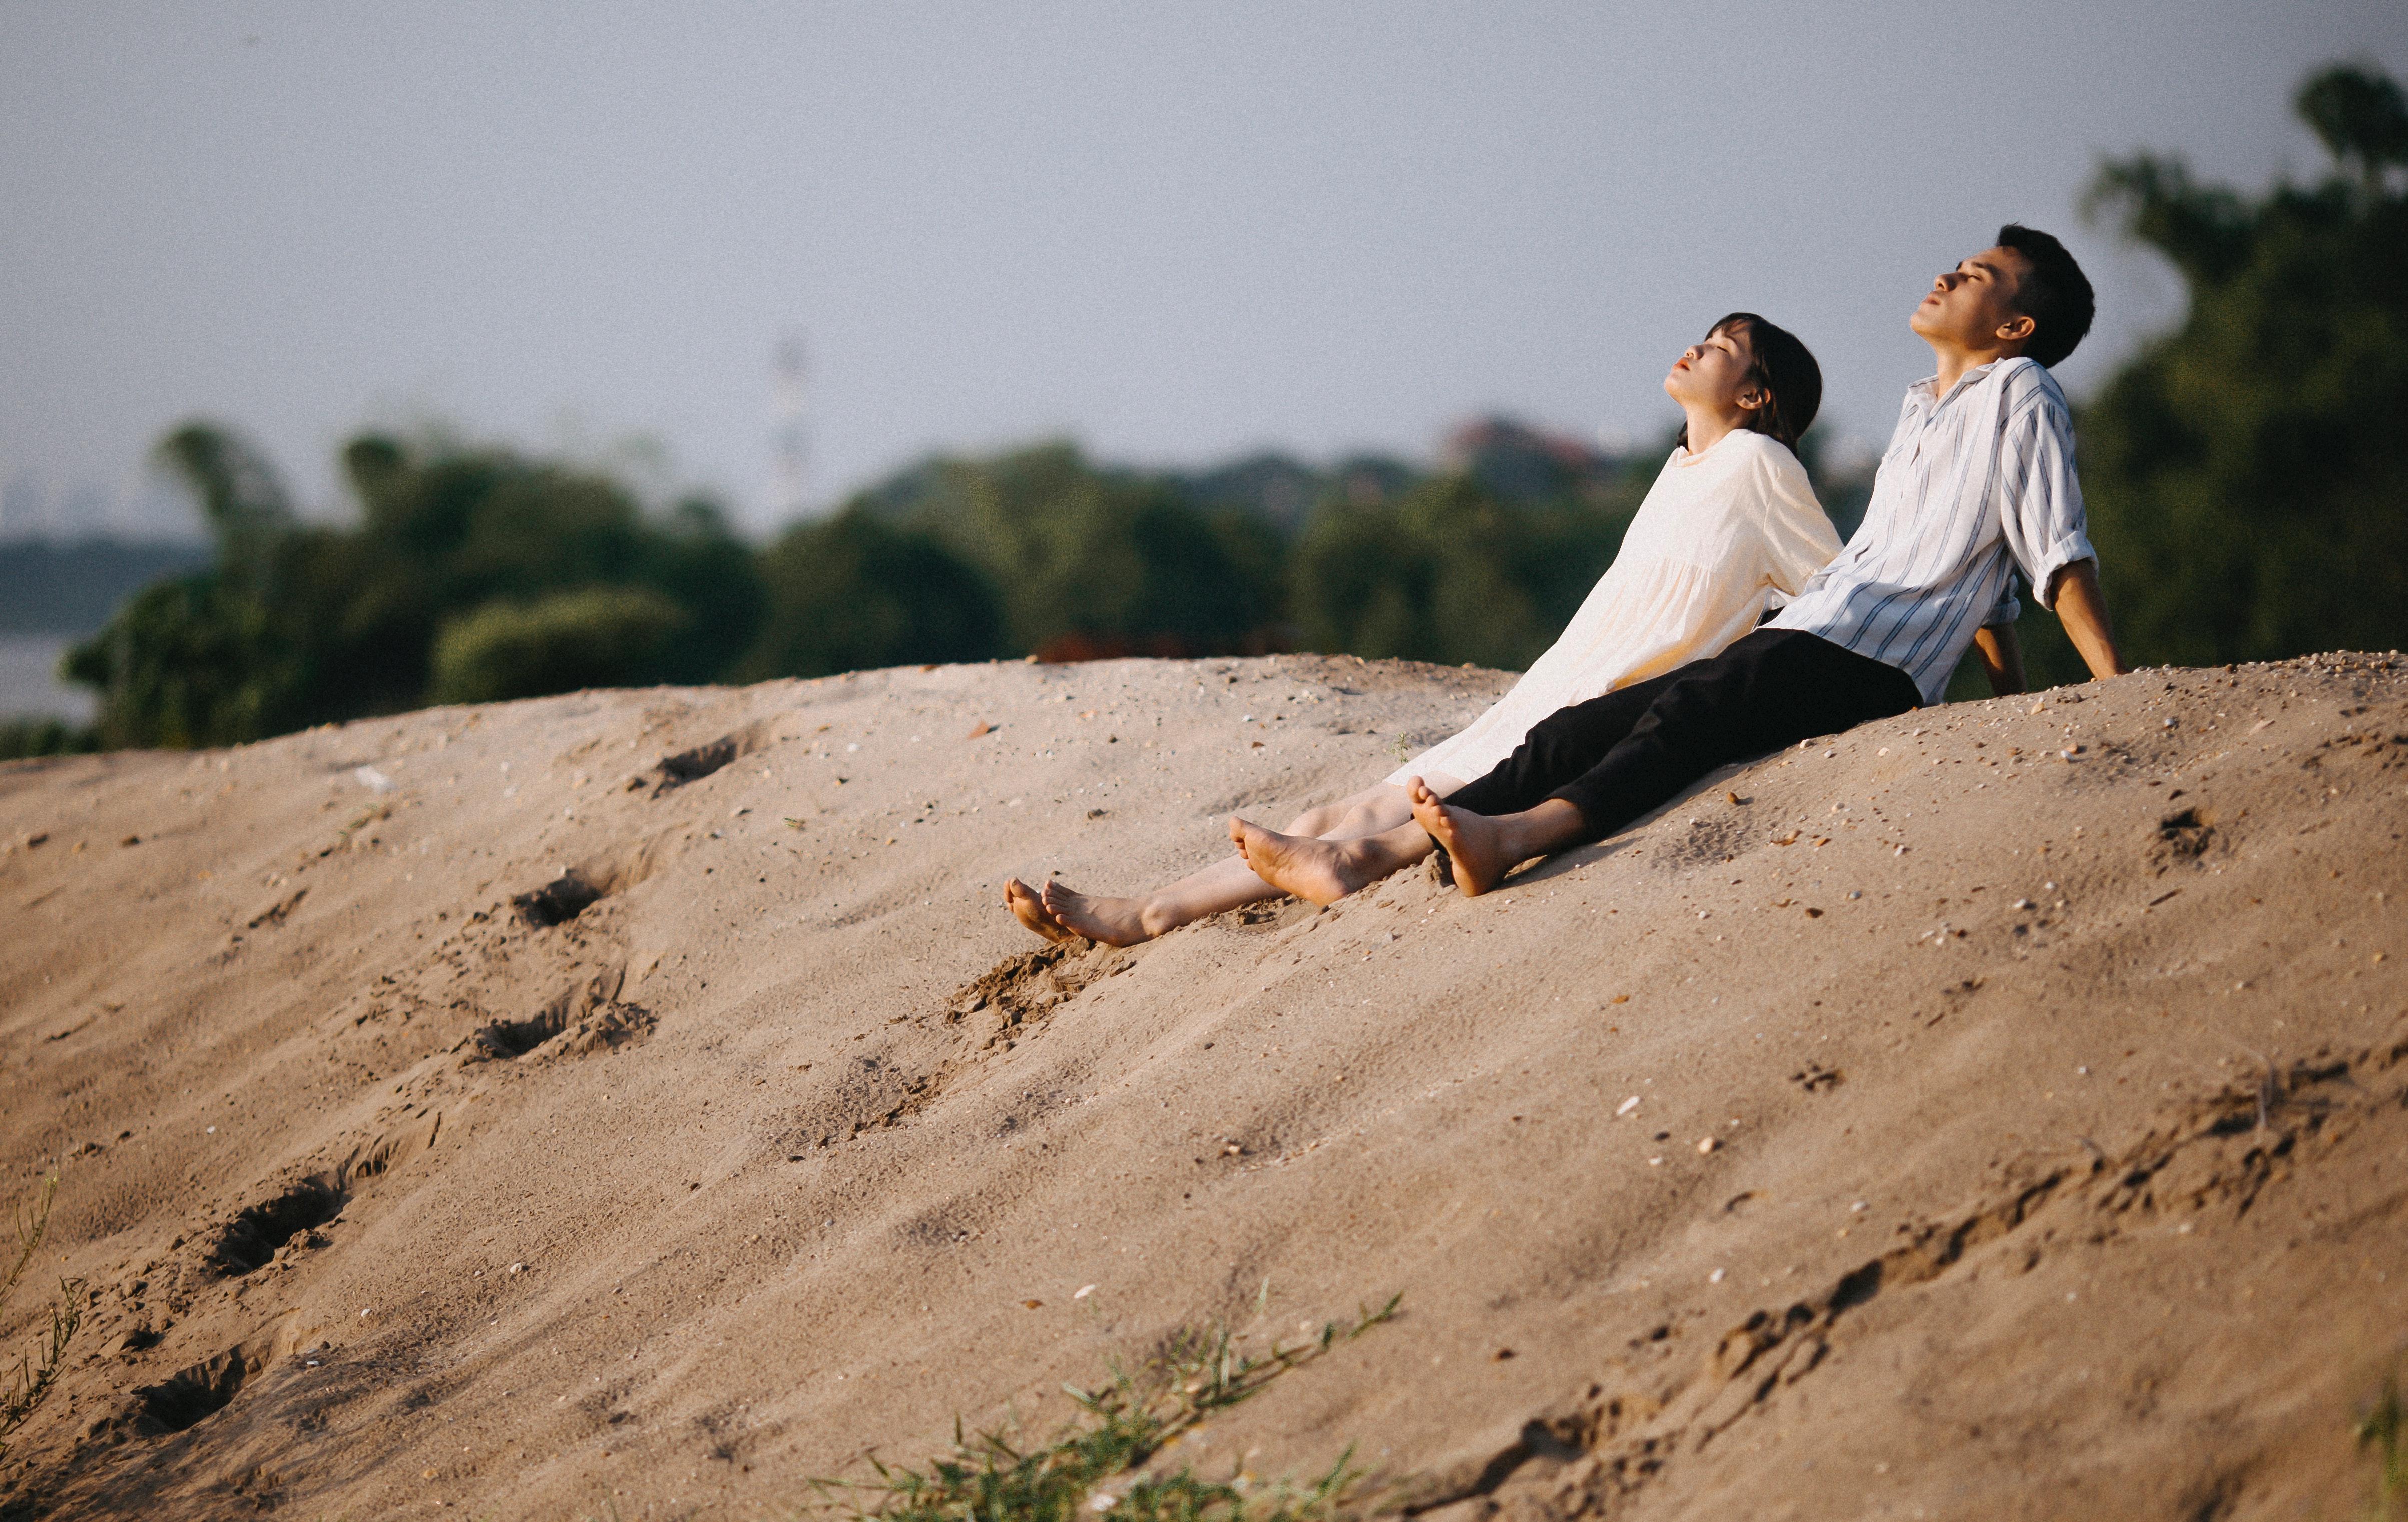 Free Images Beach Boy Couple Daylight Girl Landscape